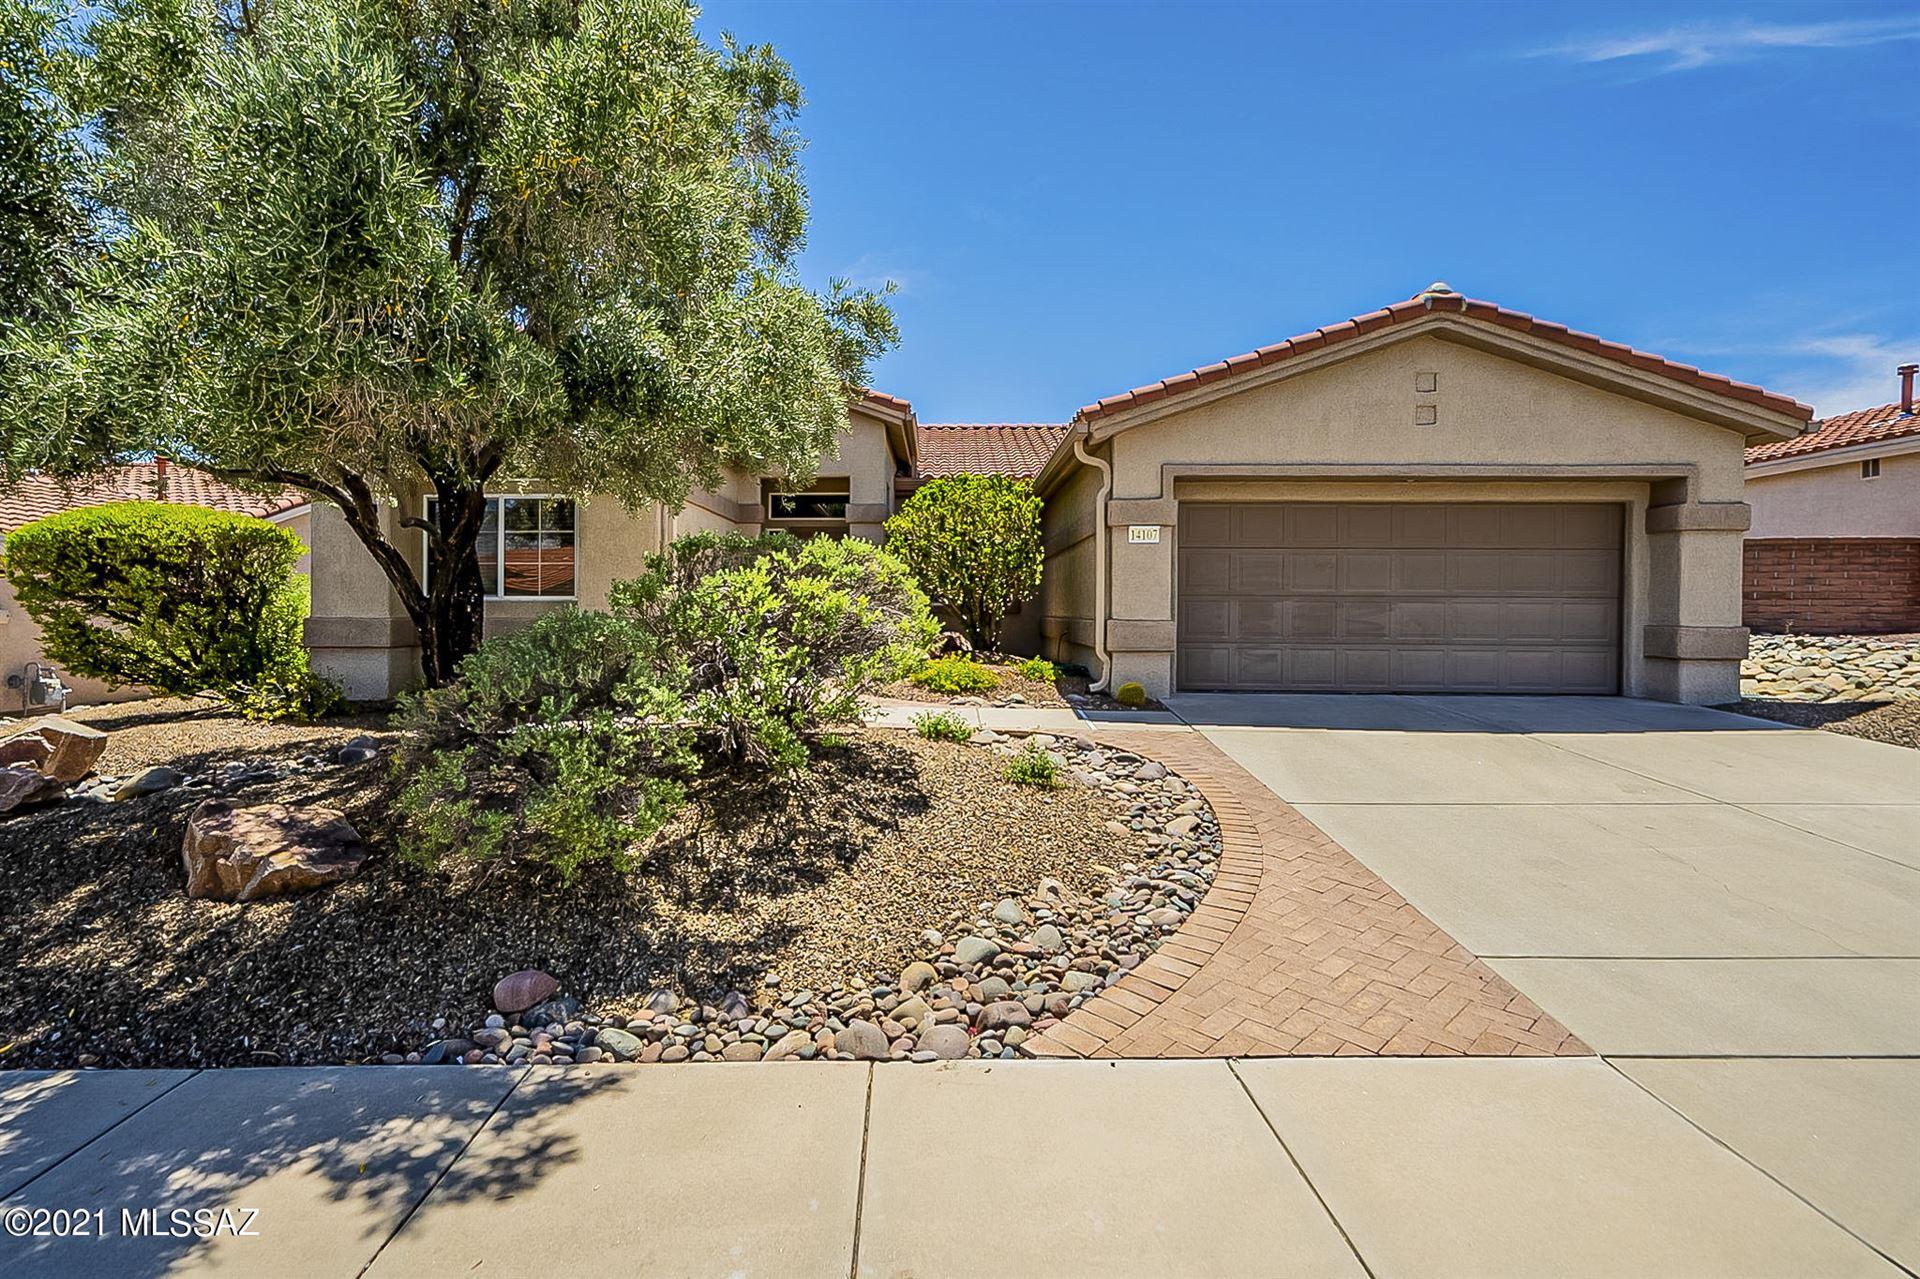 14107 N Biltmore Drive, Oro Valley, AZ 85755 - MLS#: 22116554